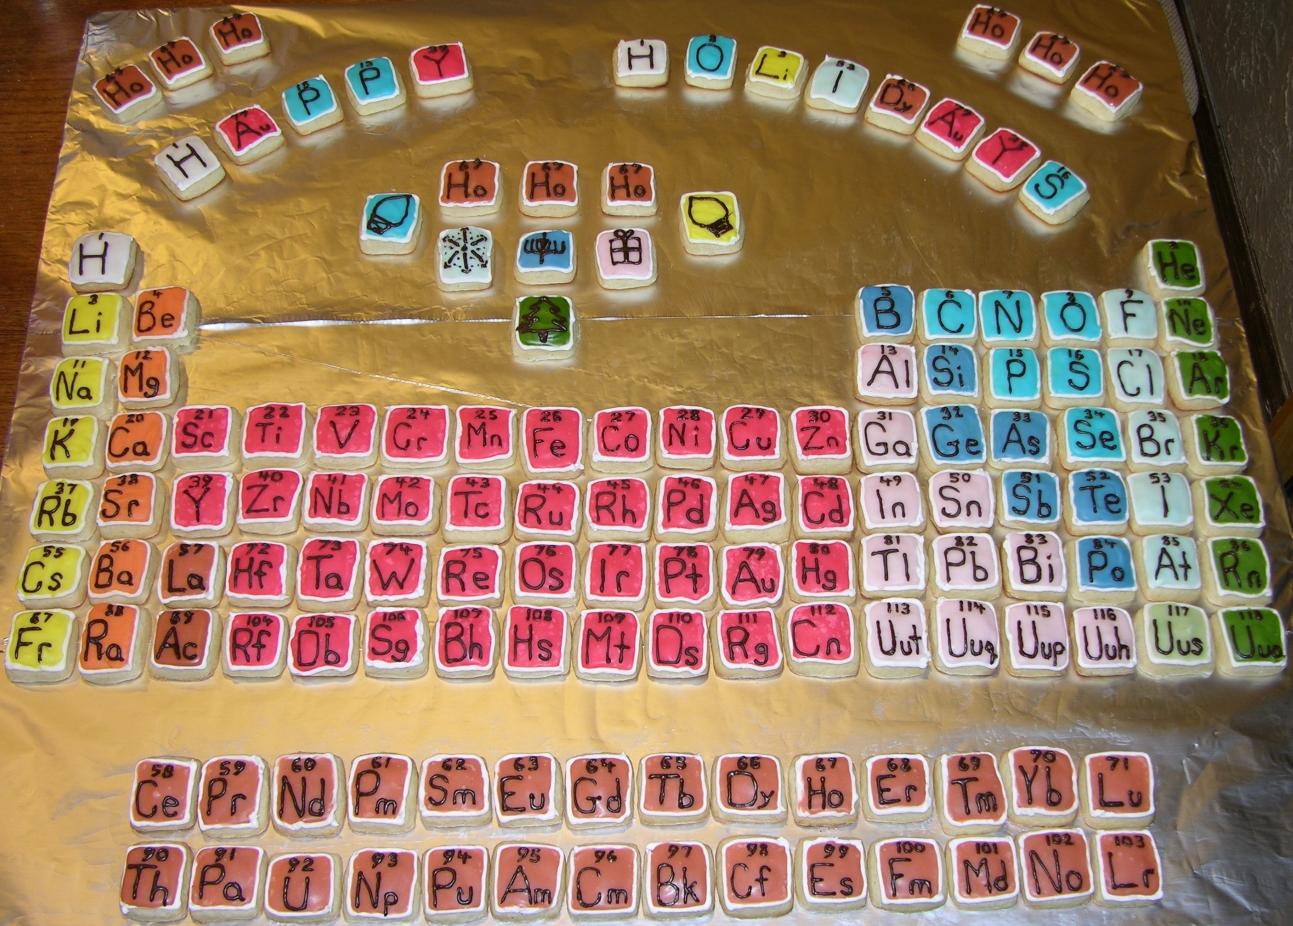 Basherbucketlist periodic table cookies simon basher basherbucketlist periodic table cookies simon basher gamestrikefo Images